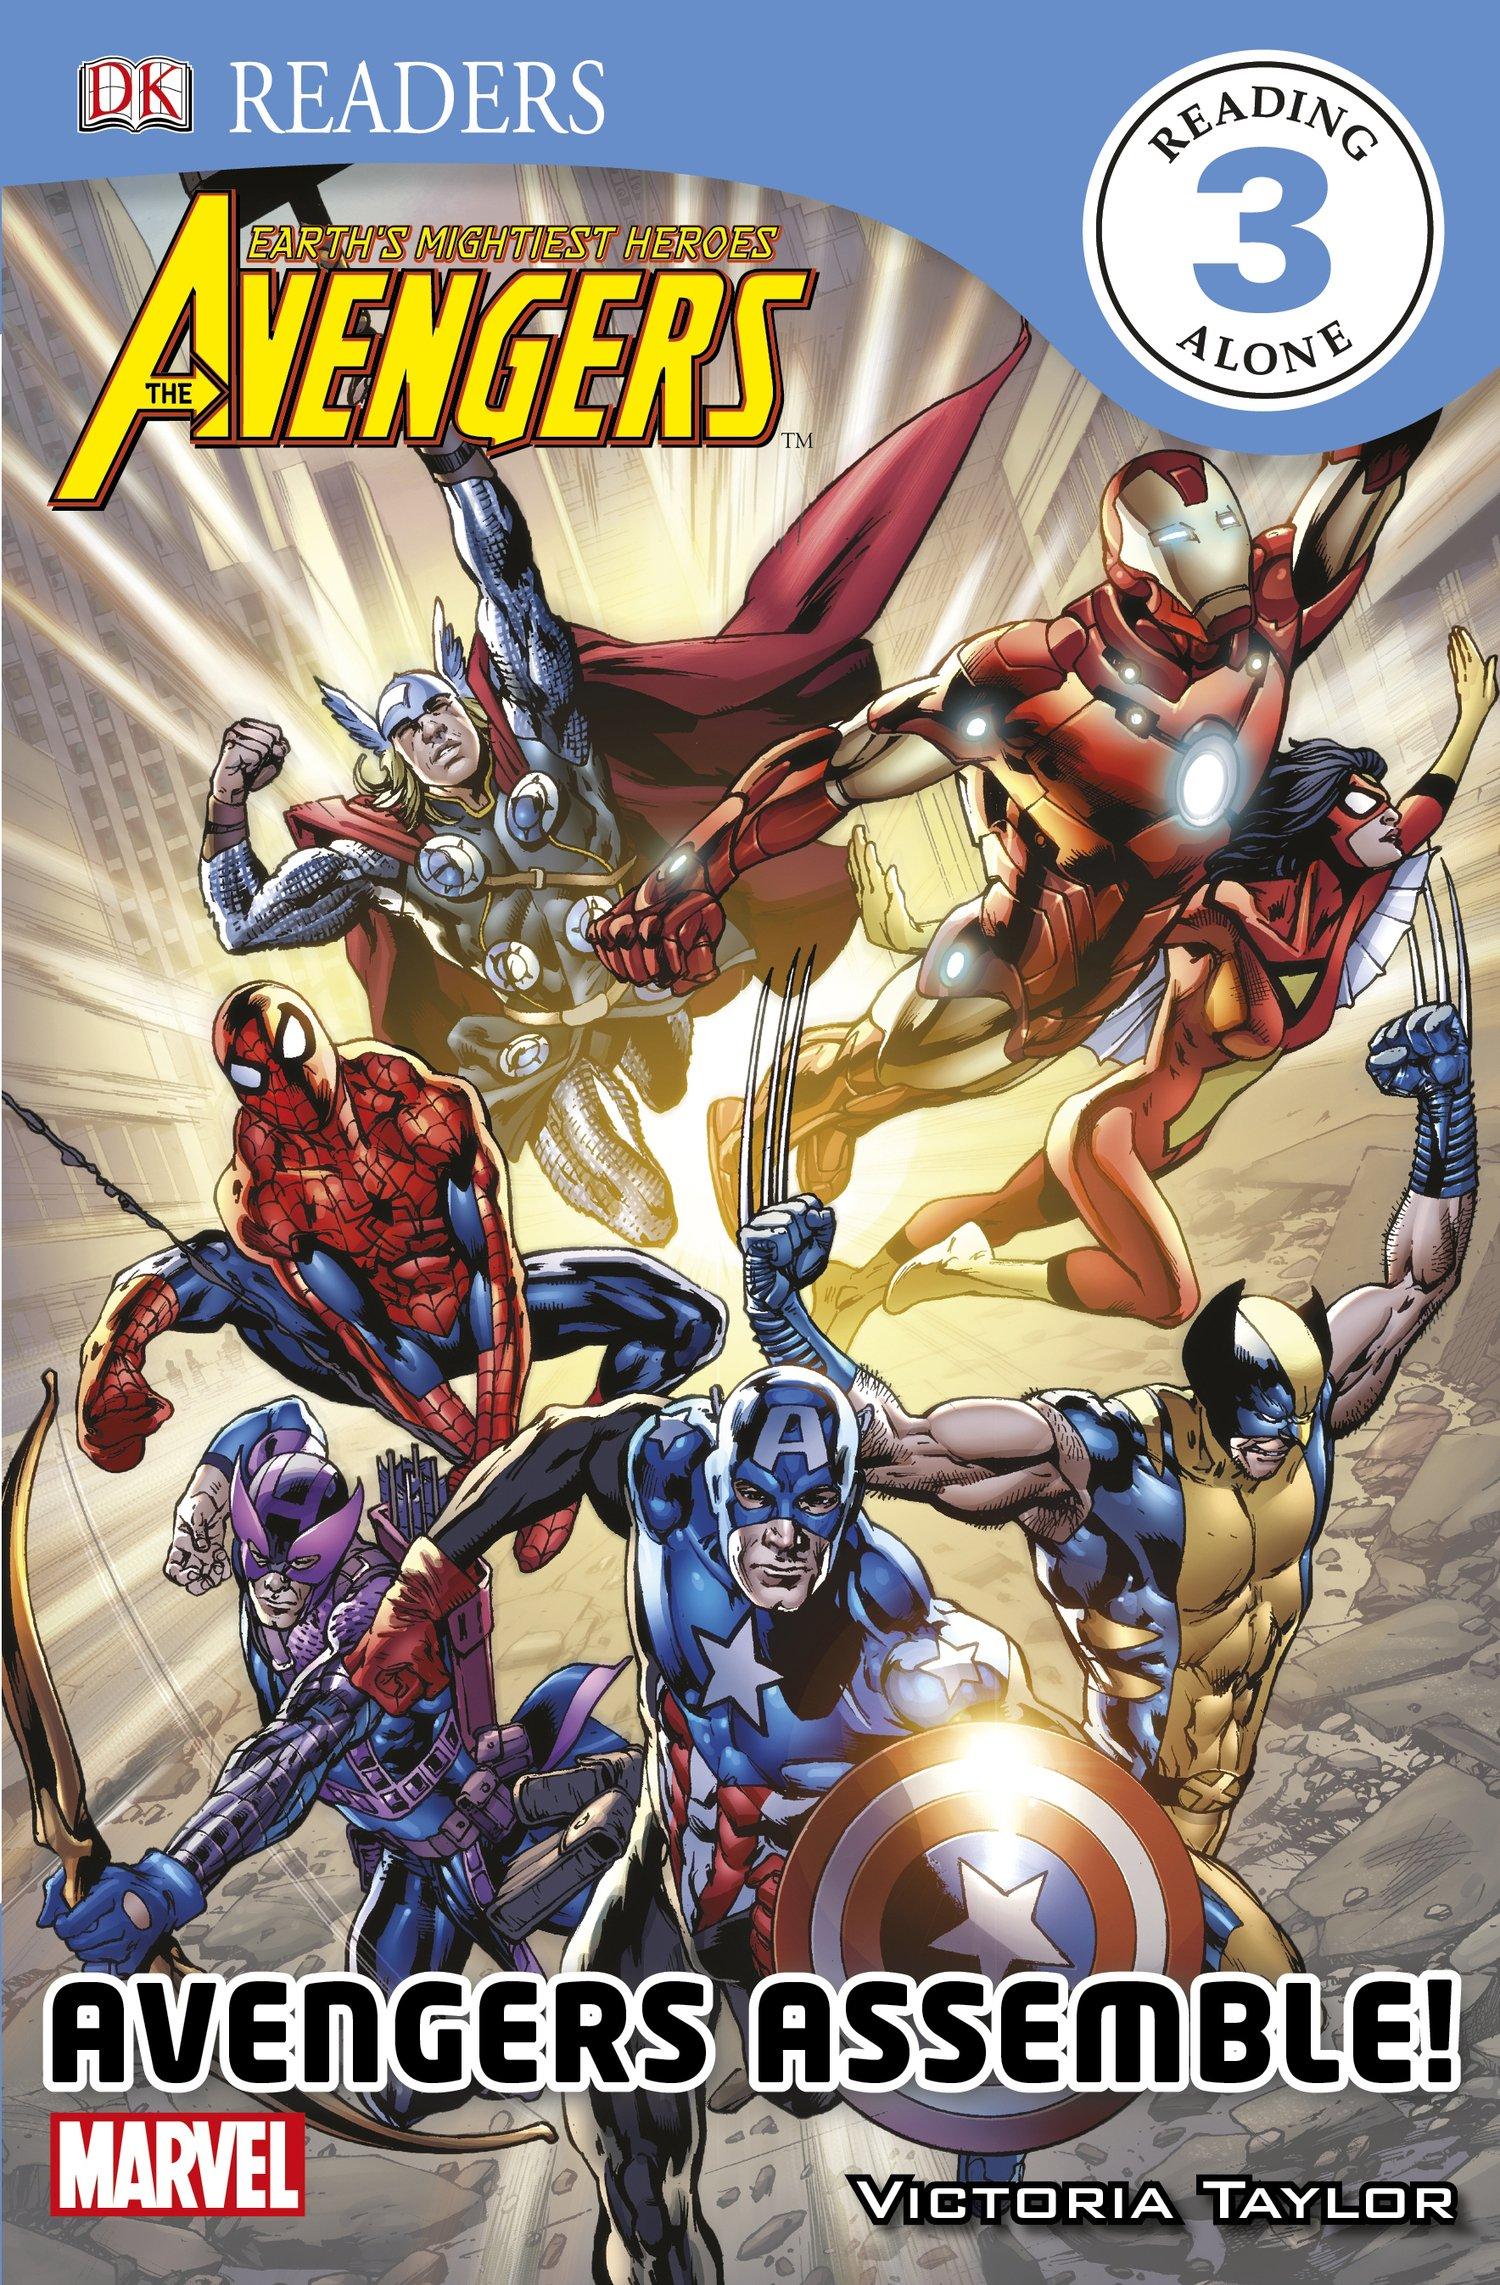 Download DK Readers L3: The Avengers: Avengers Assemble! PDF